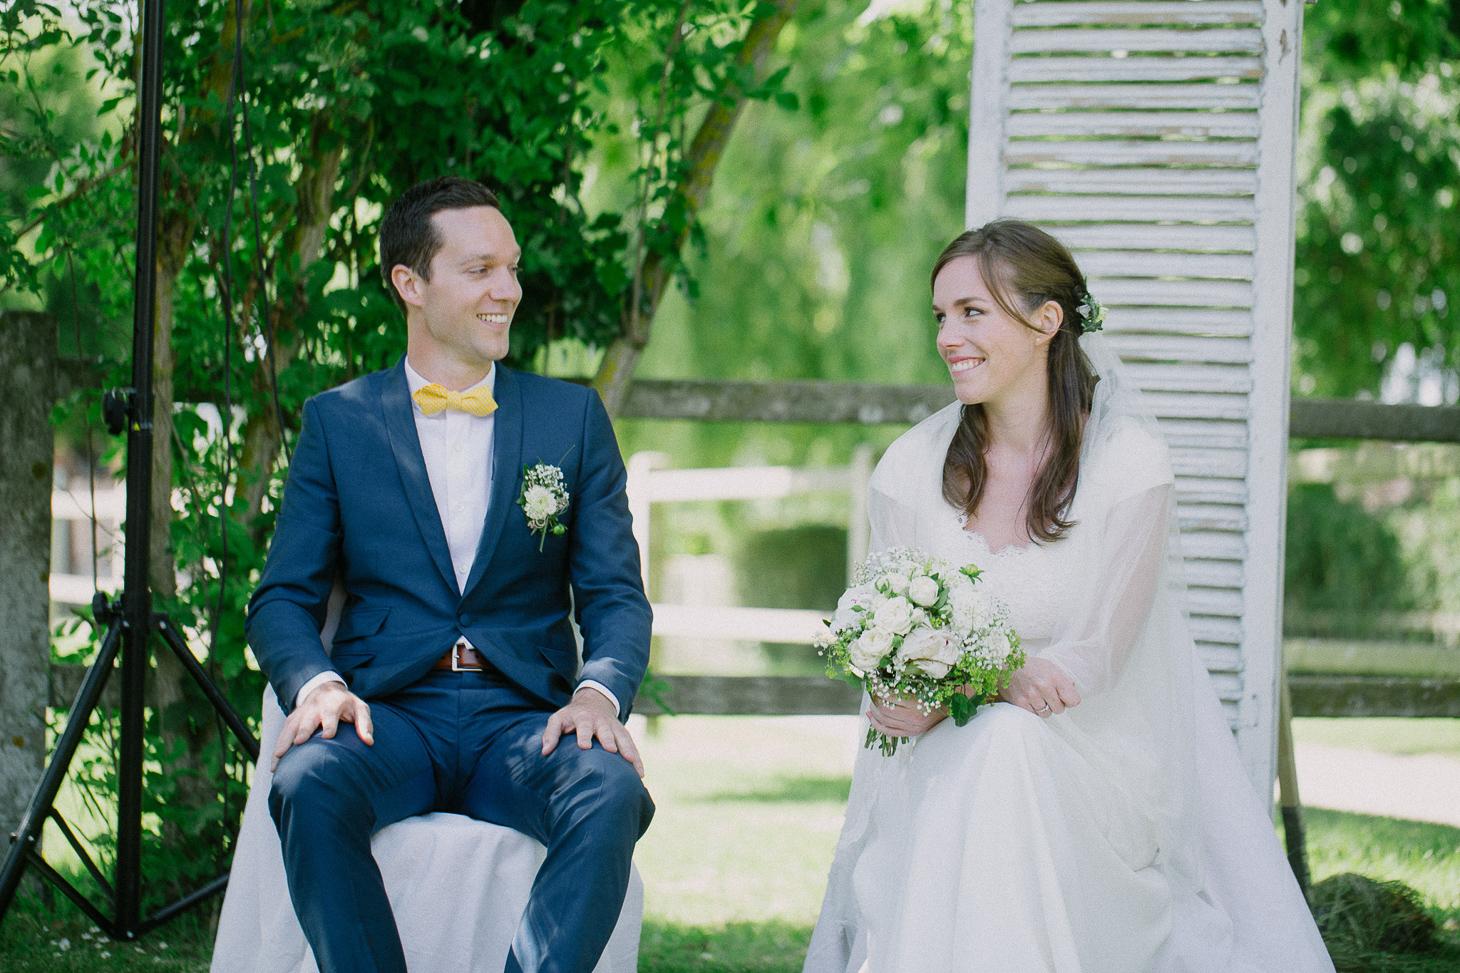 photographe-mariage-champ-de-launay-normandie-00033